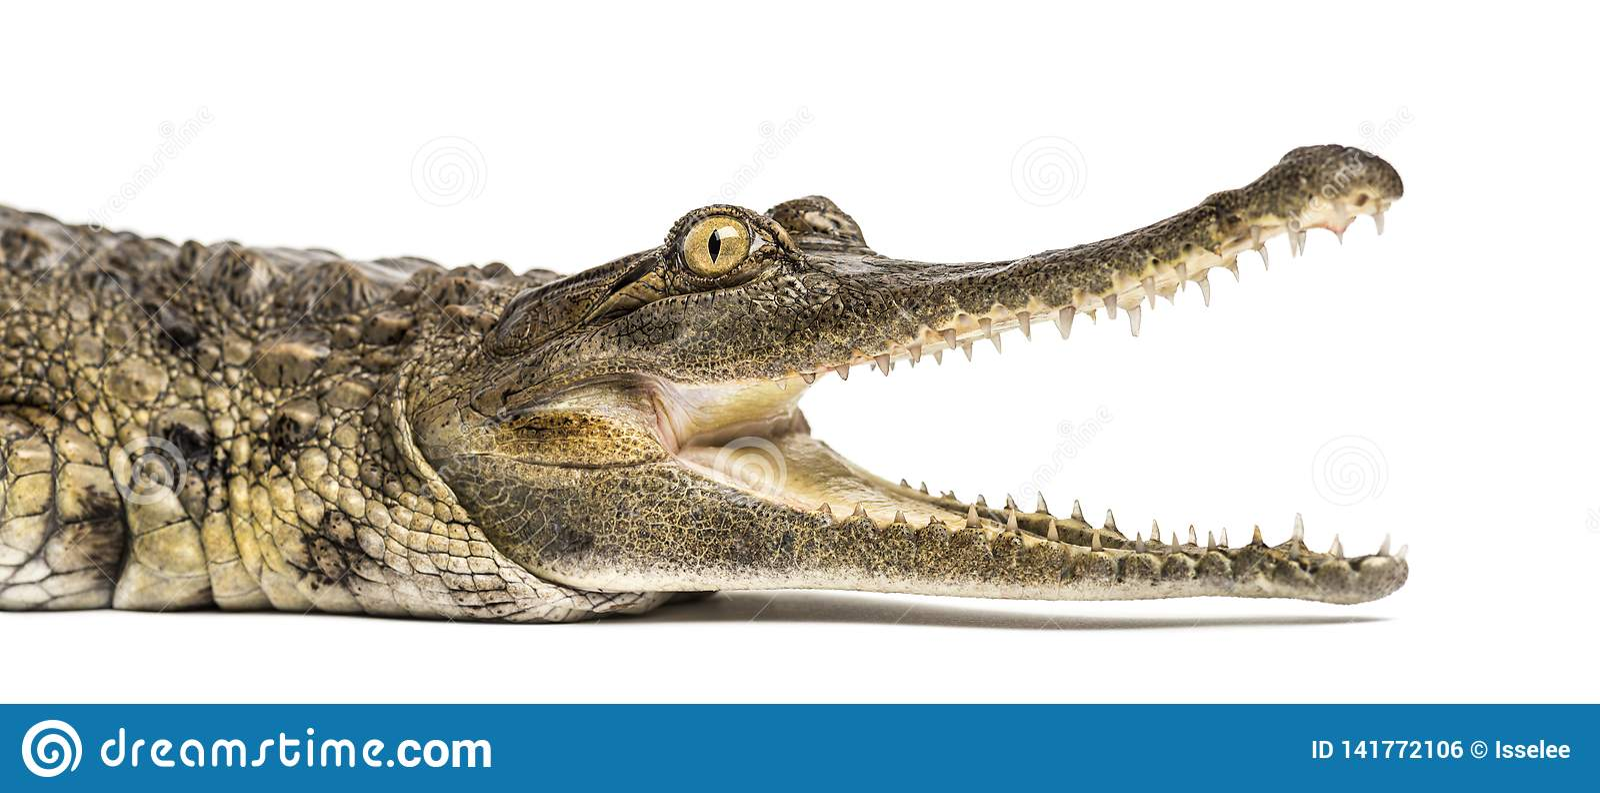 Het westen - Afrikaanse slank-gewroete geïsoleerde krokodil, 3 jaar oud,